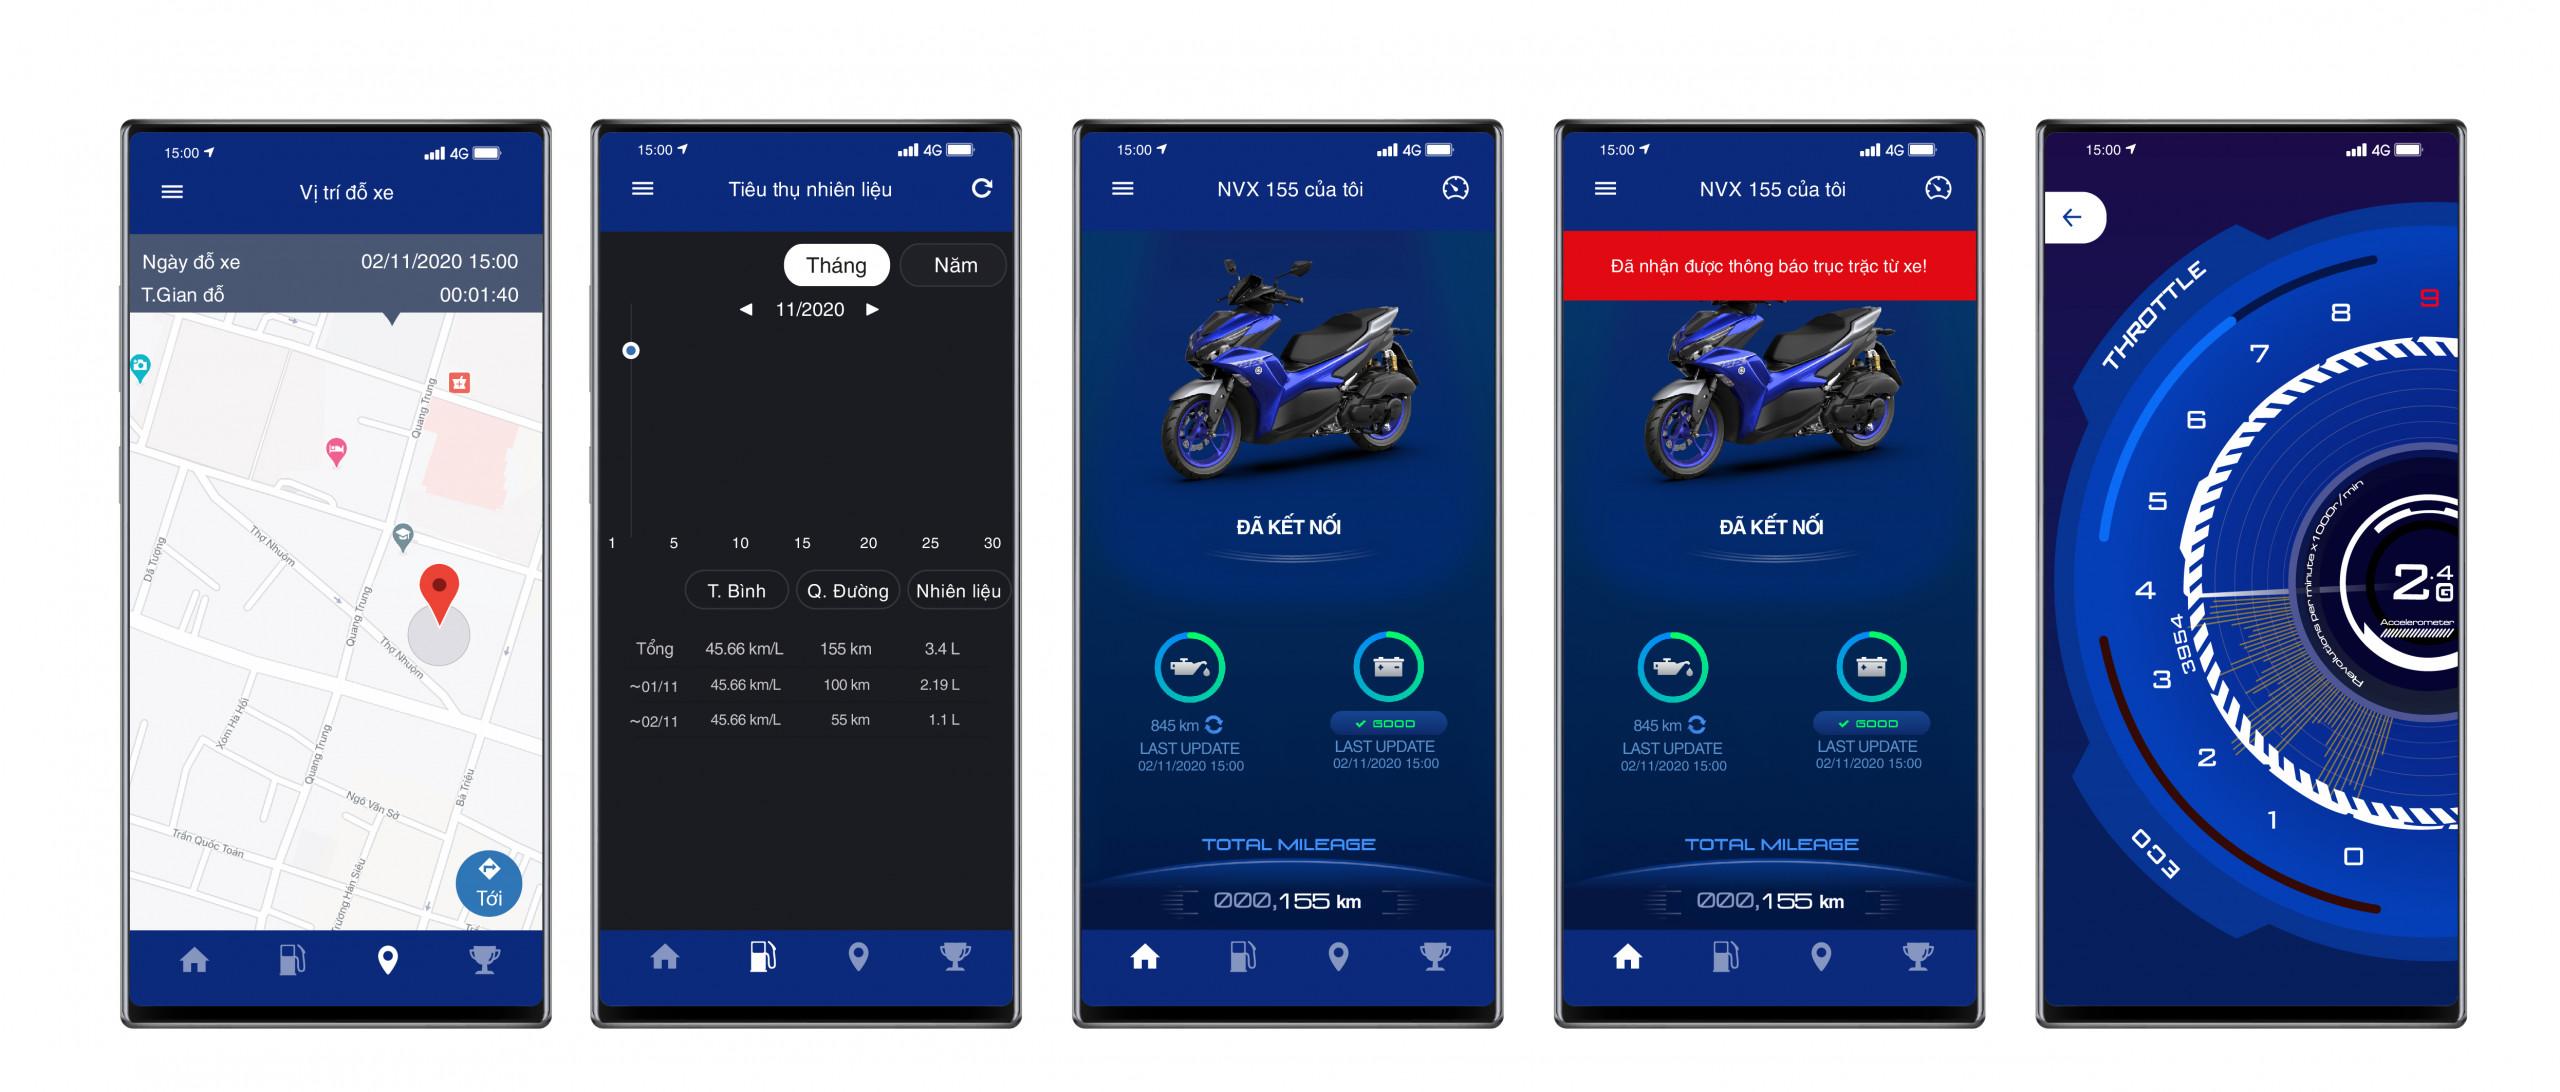 Ứng dụng Yamaha Y Connect